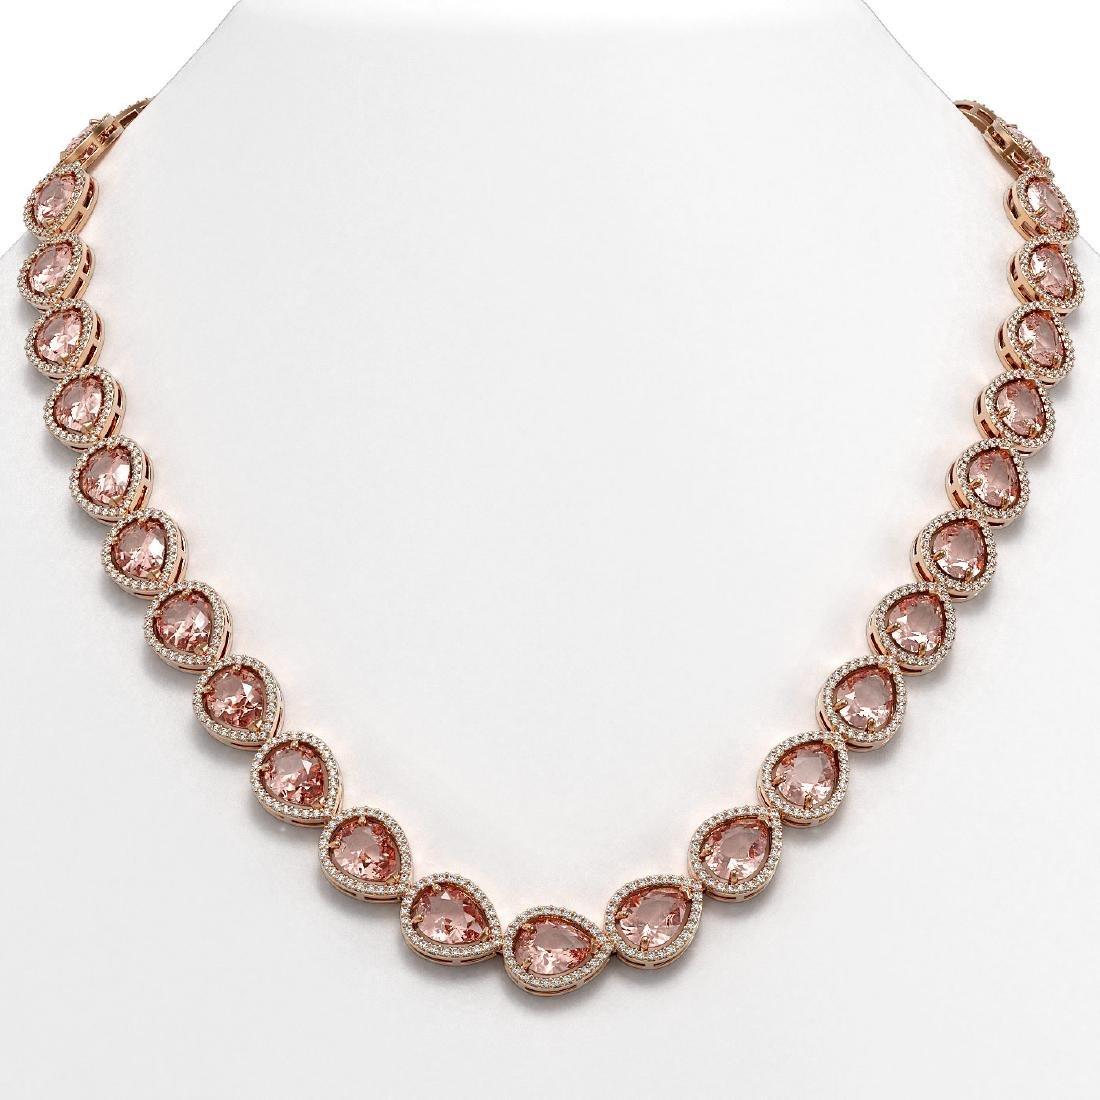 41.6 CTW Morganite & Diamond Halo Necklace 10K Rose